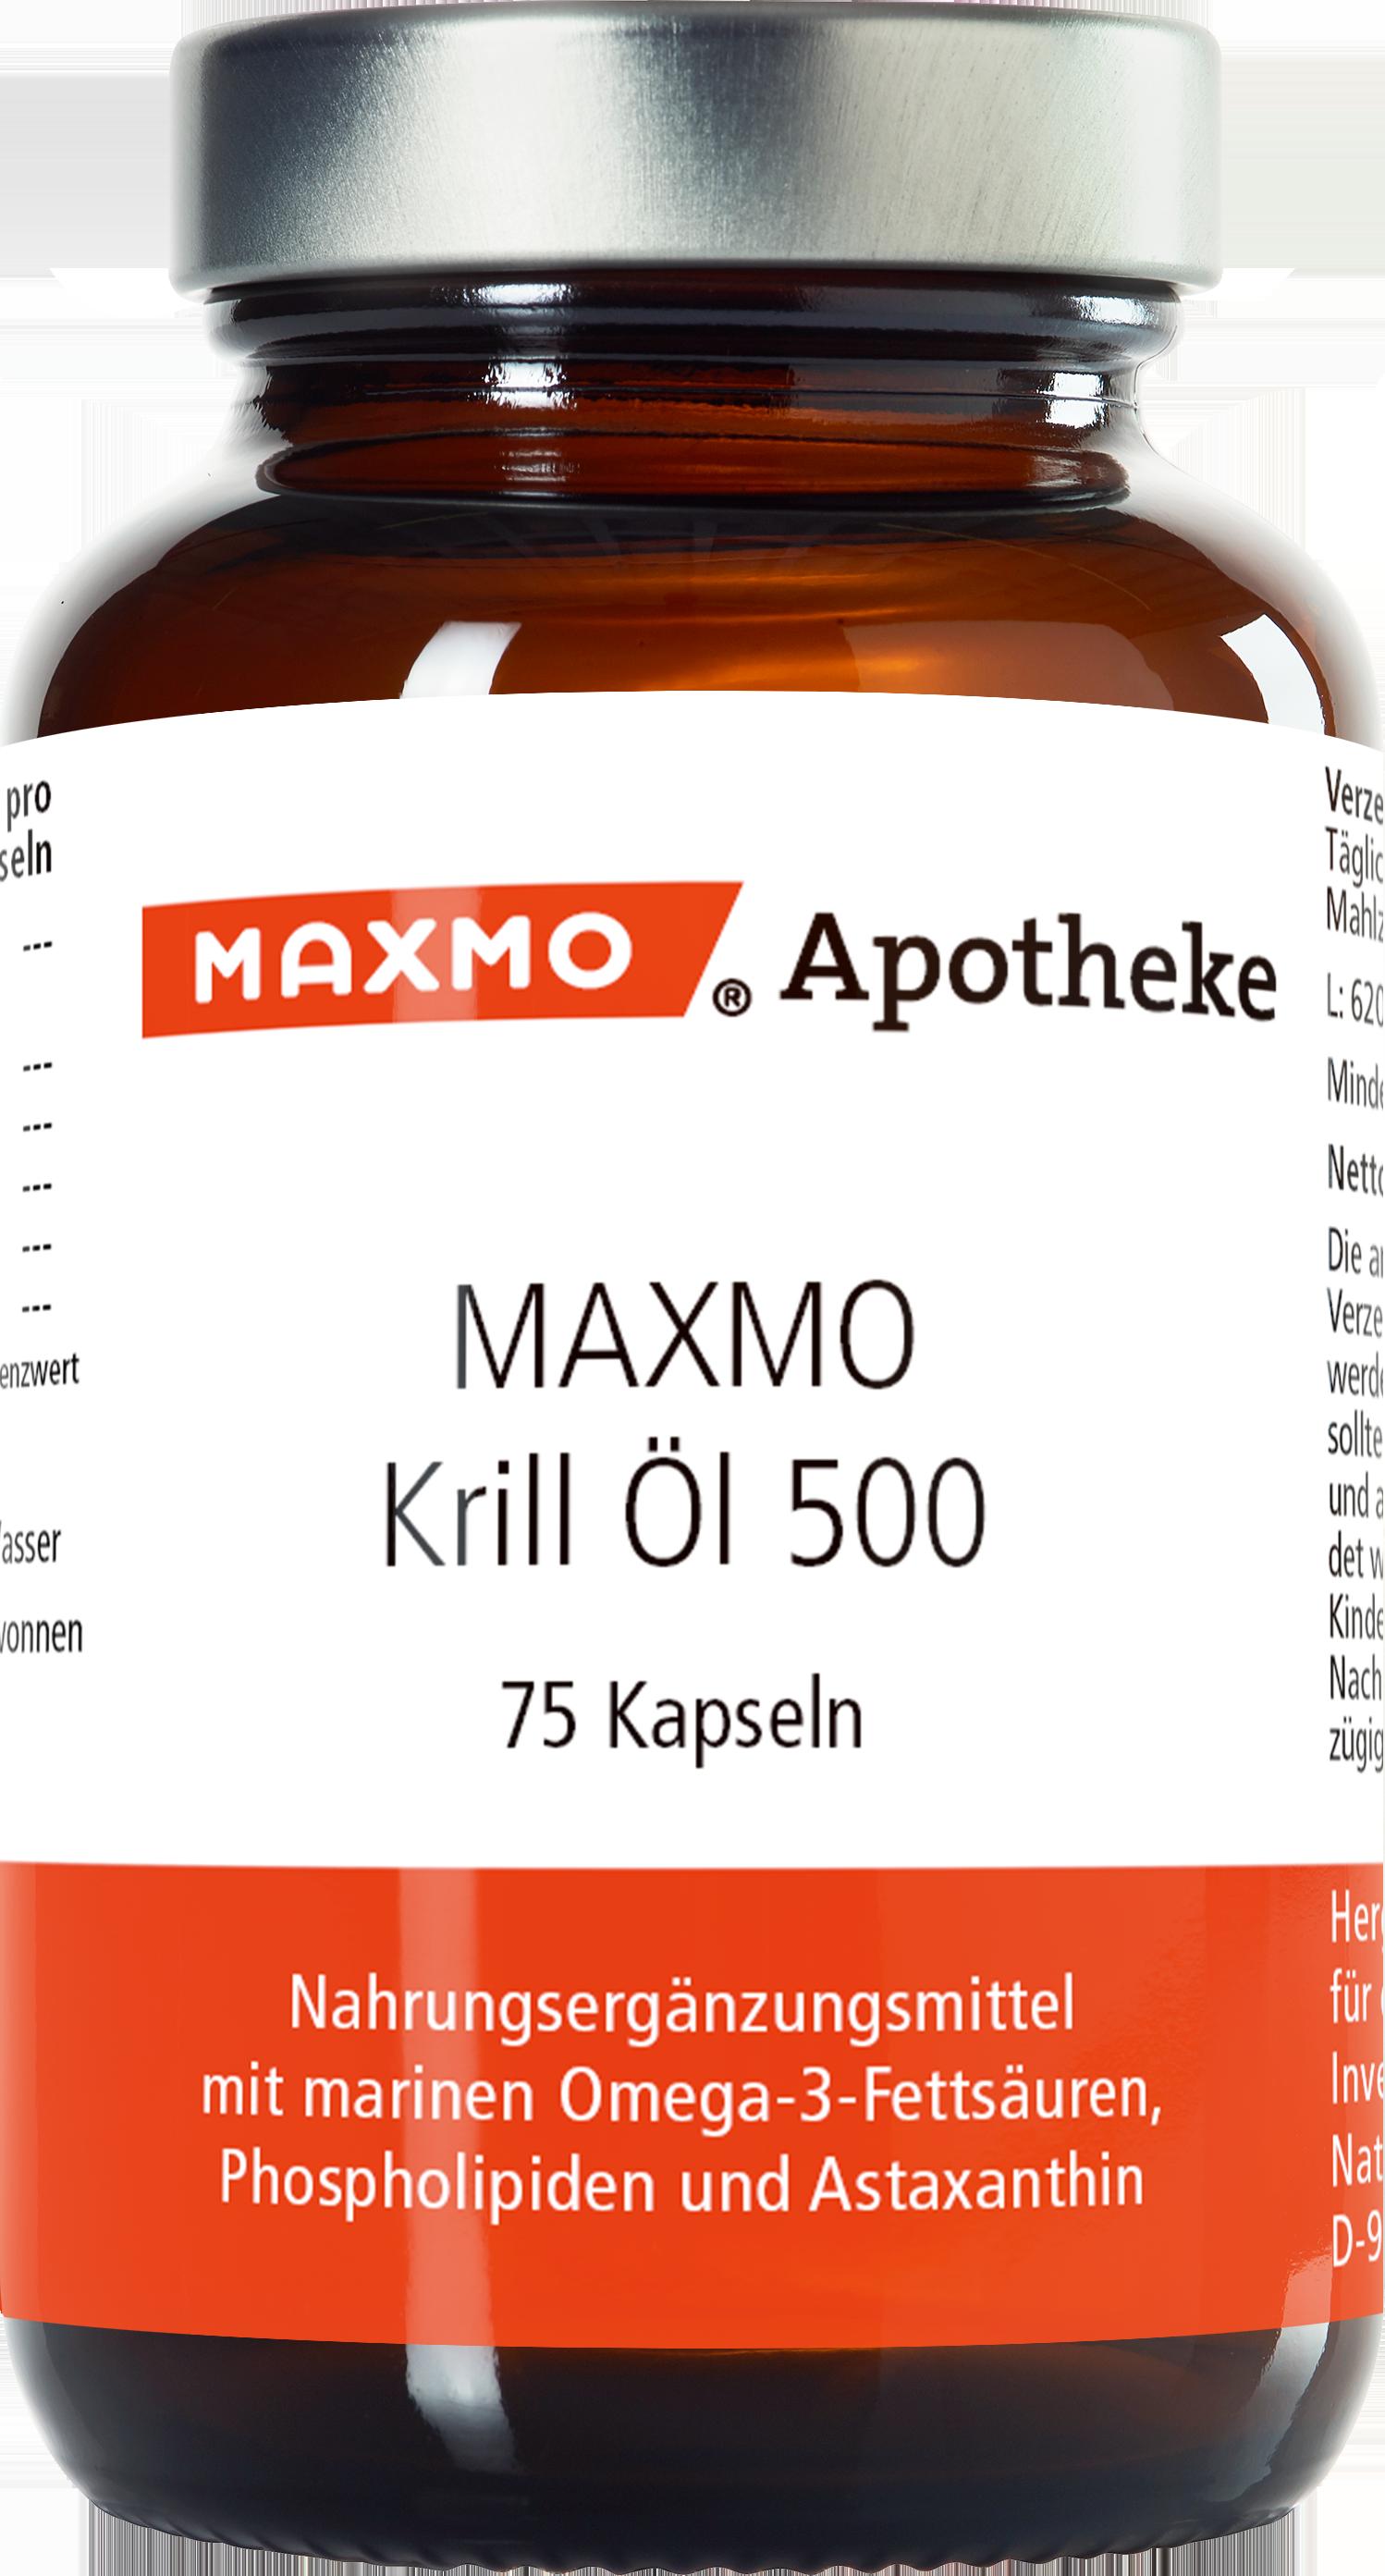 MAXMO Krill Öl 500 Kapseln